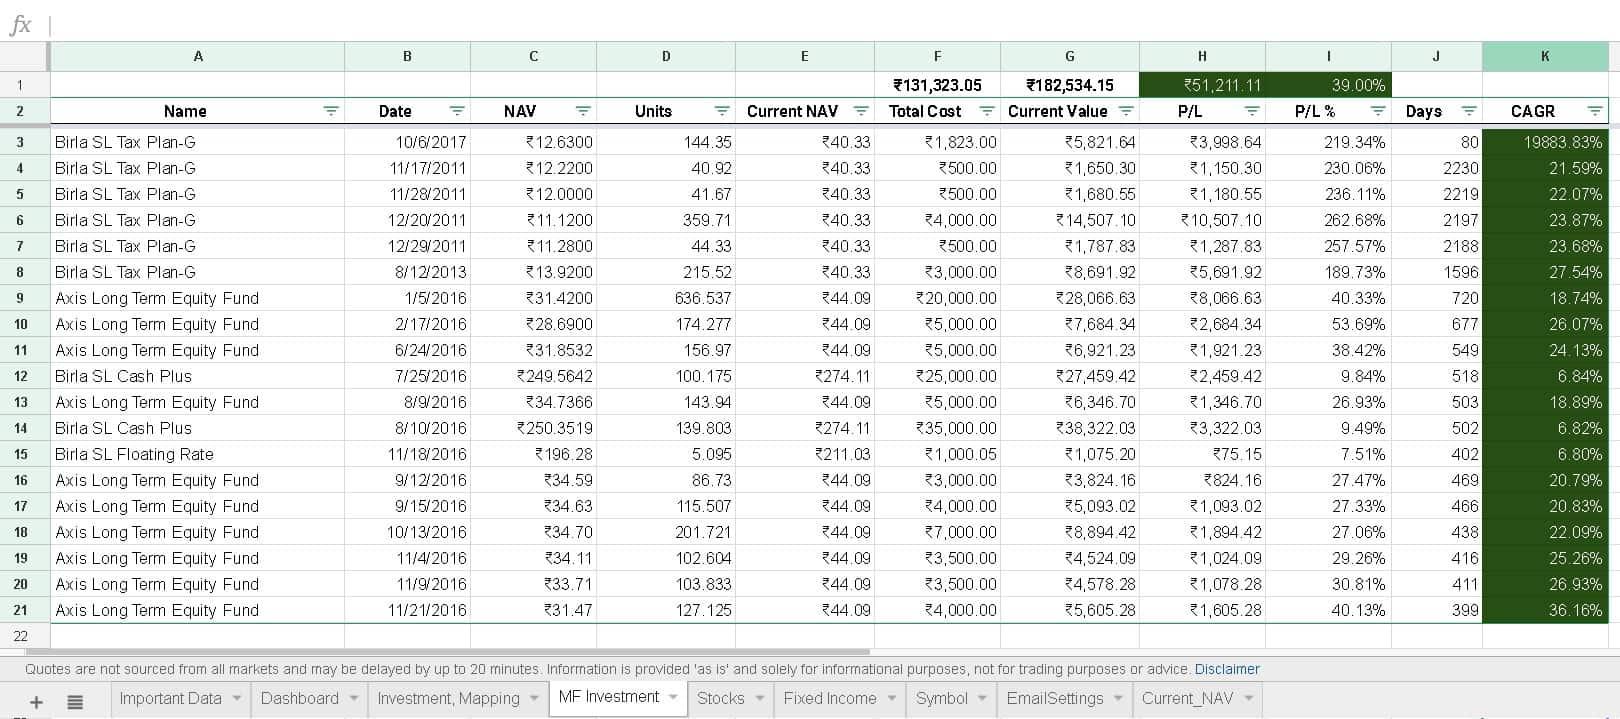 Portfolio Rebalancing Excel Spreadsheet With Google Spreadsheet Portfolio Tracker For Stocks And Mutual Funds